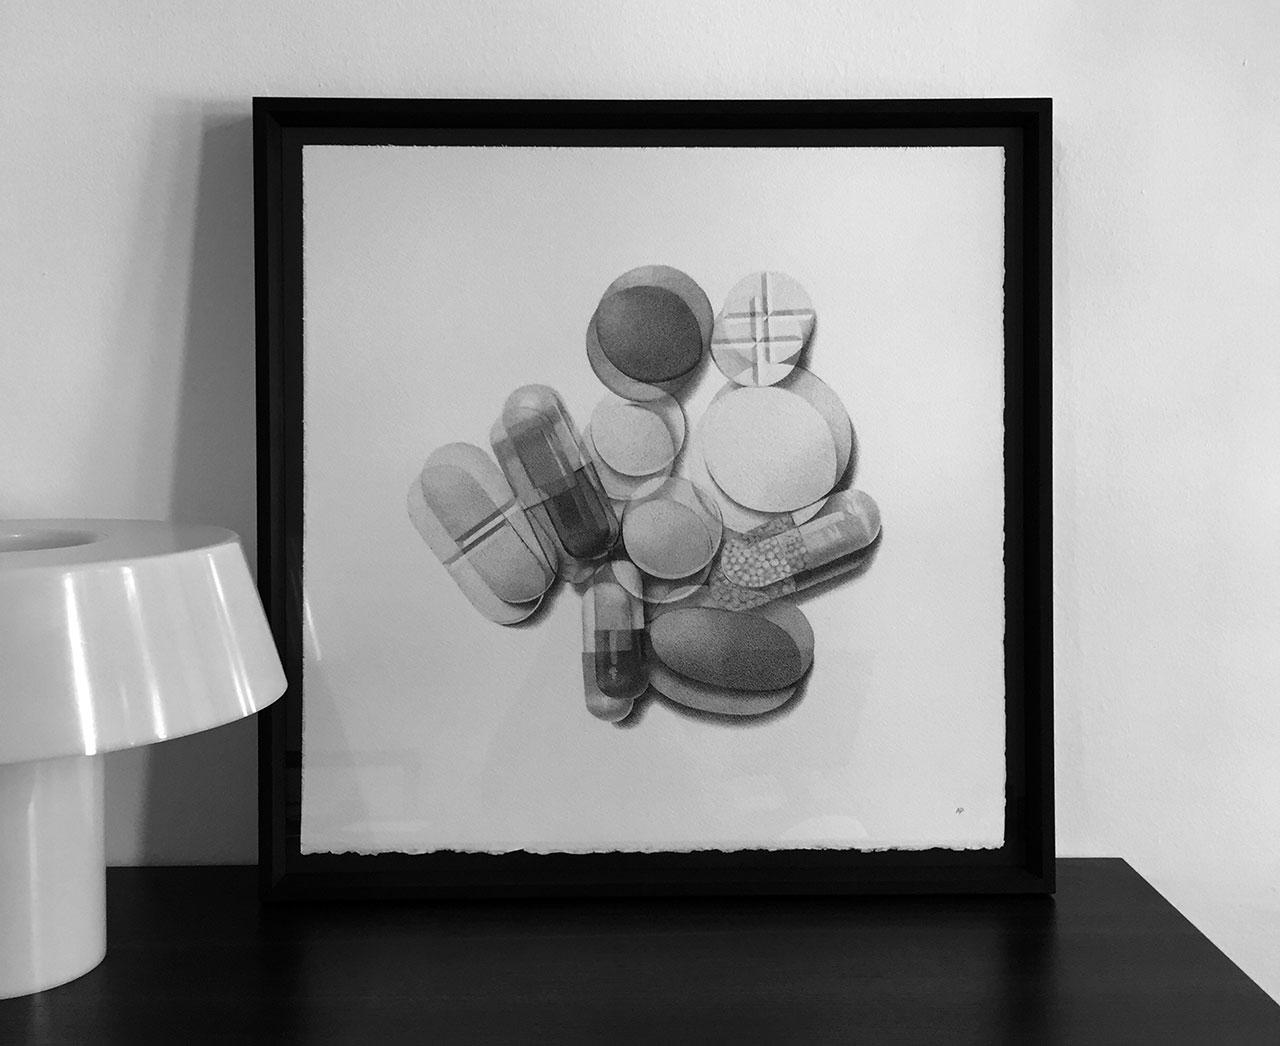 Alessandro Paglia,DOUBLE VISION PILLS, 56 x 56 cm unframed.